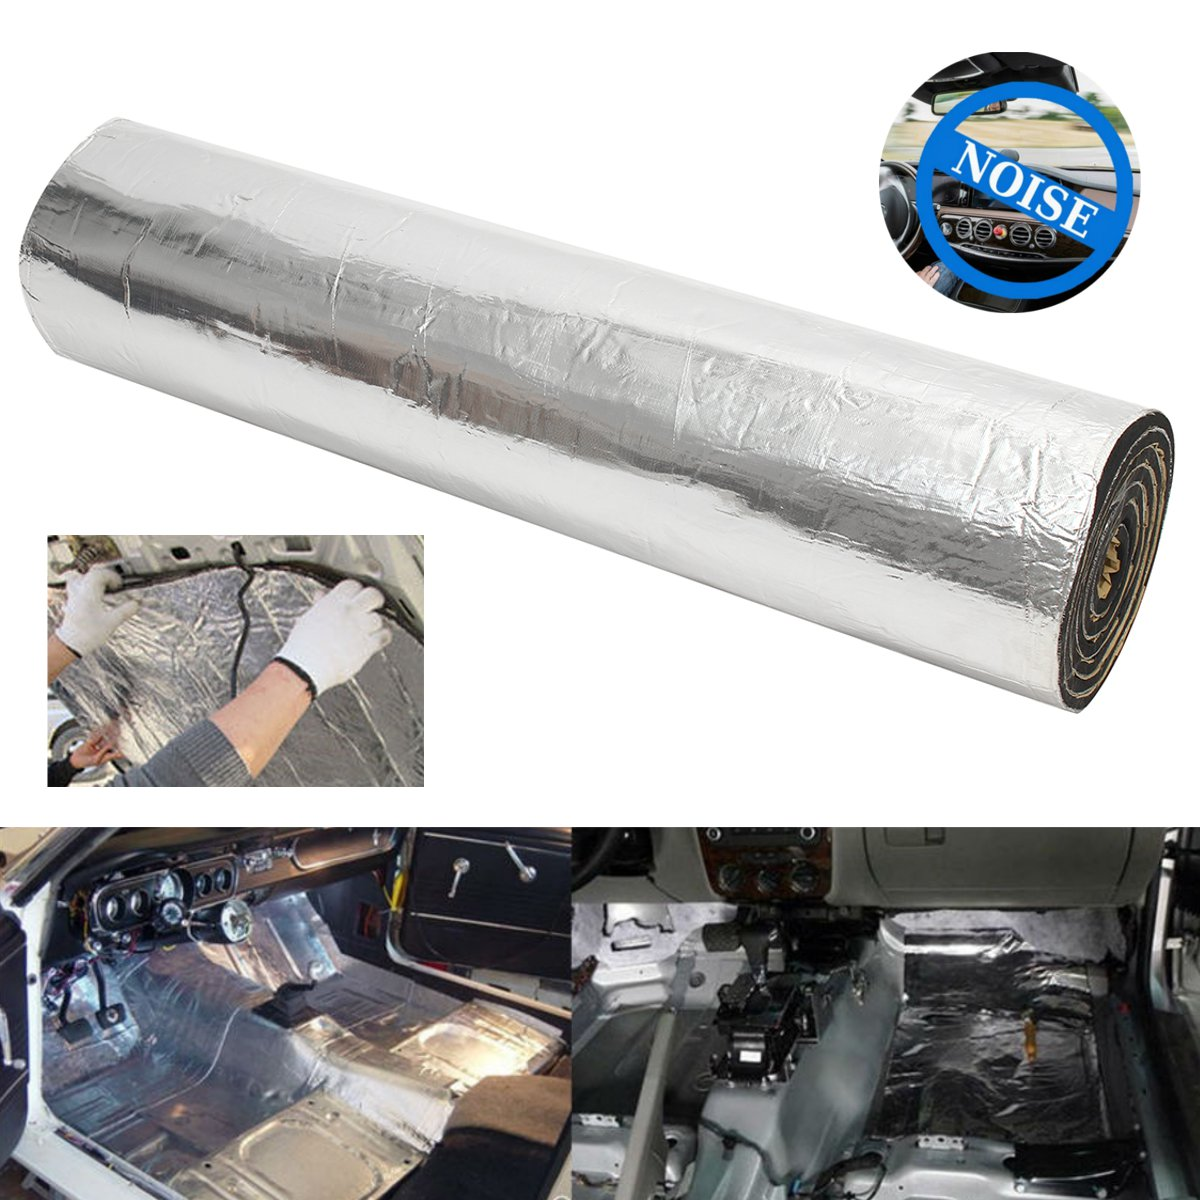 10mm 800X100cm Car Van Sound Proofing Deadening Insulation Foam Protector Waterproof Auto Sound Insulation Deadening Accessories